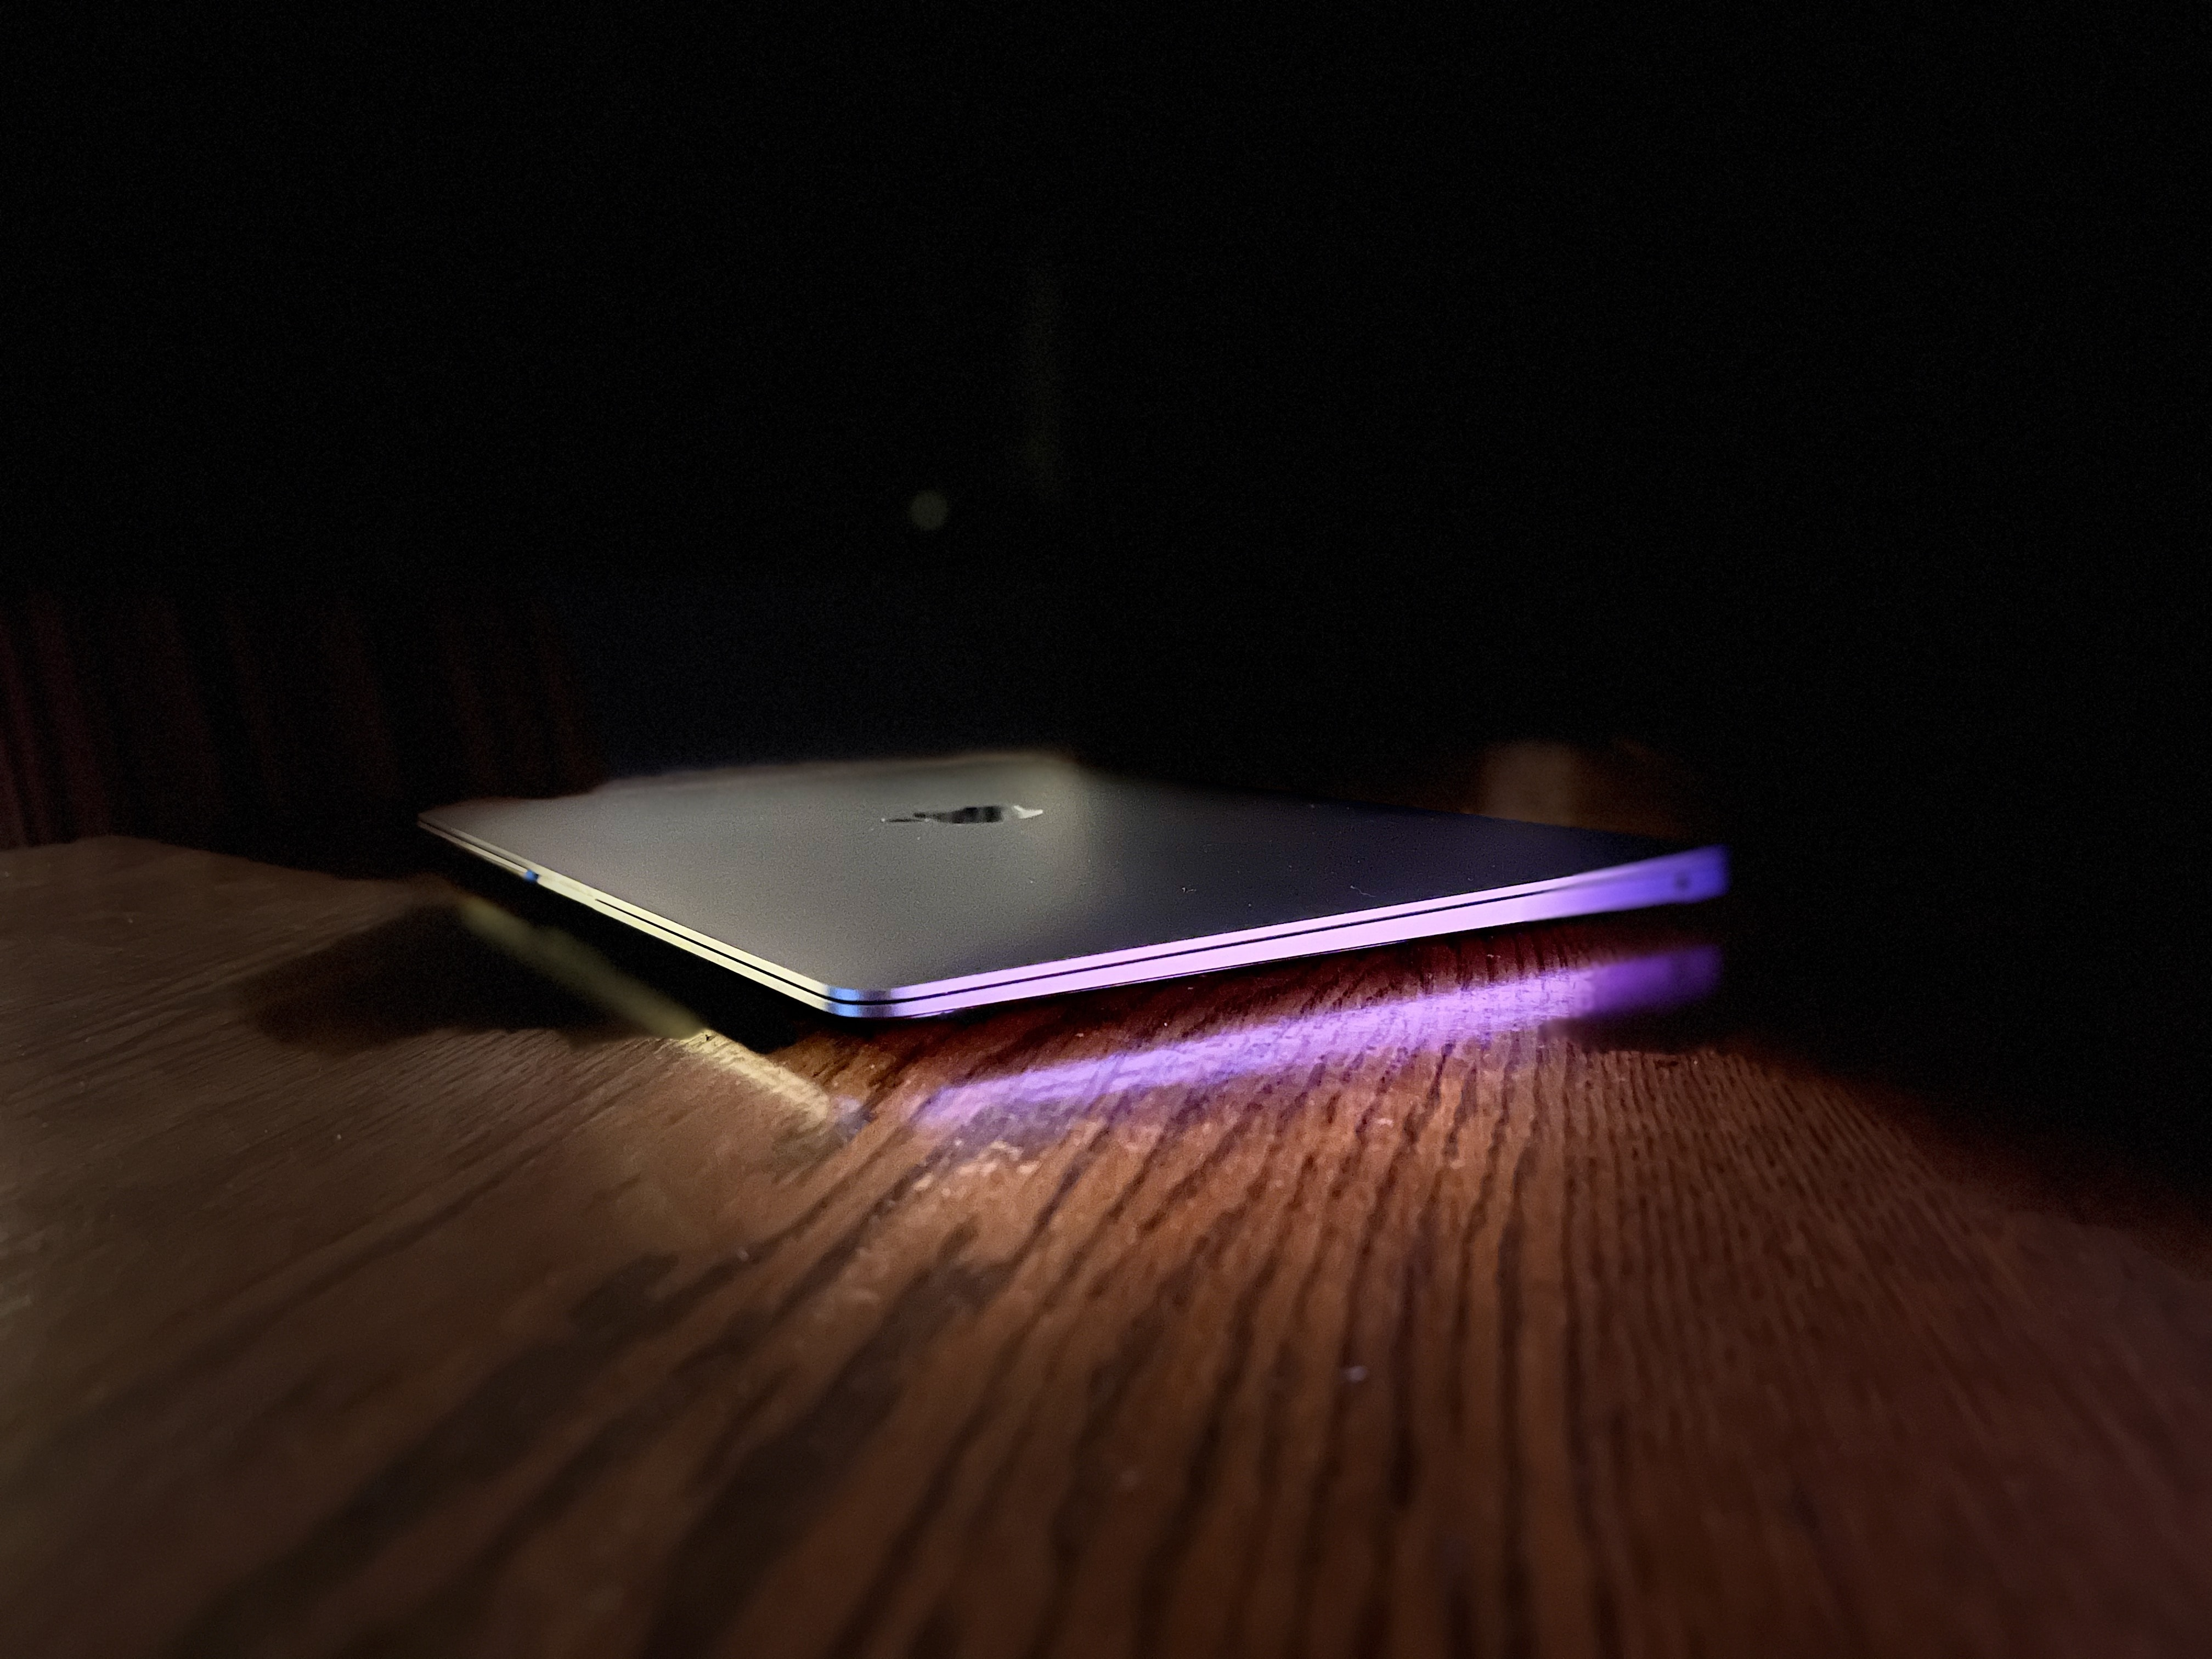 MacBook Air M1 2020: The new MacBook Air retains the same wedge profile